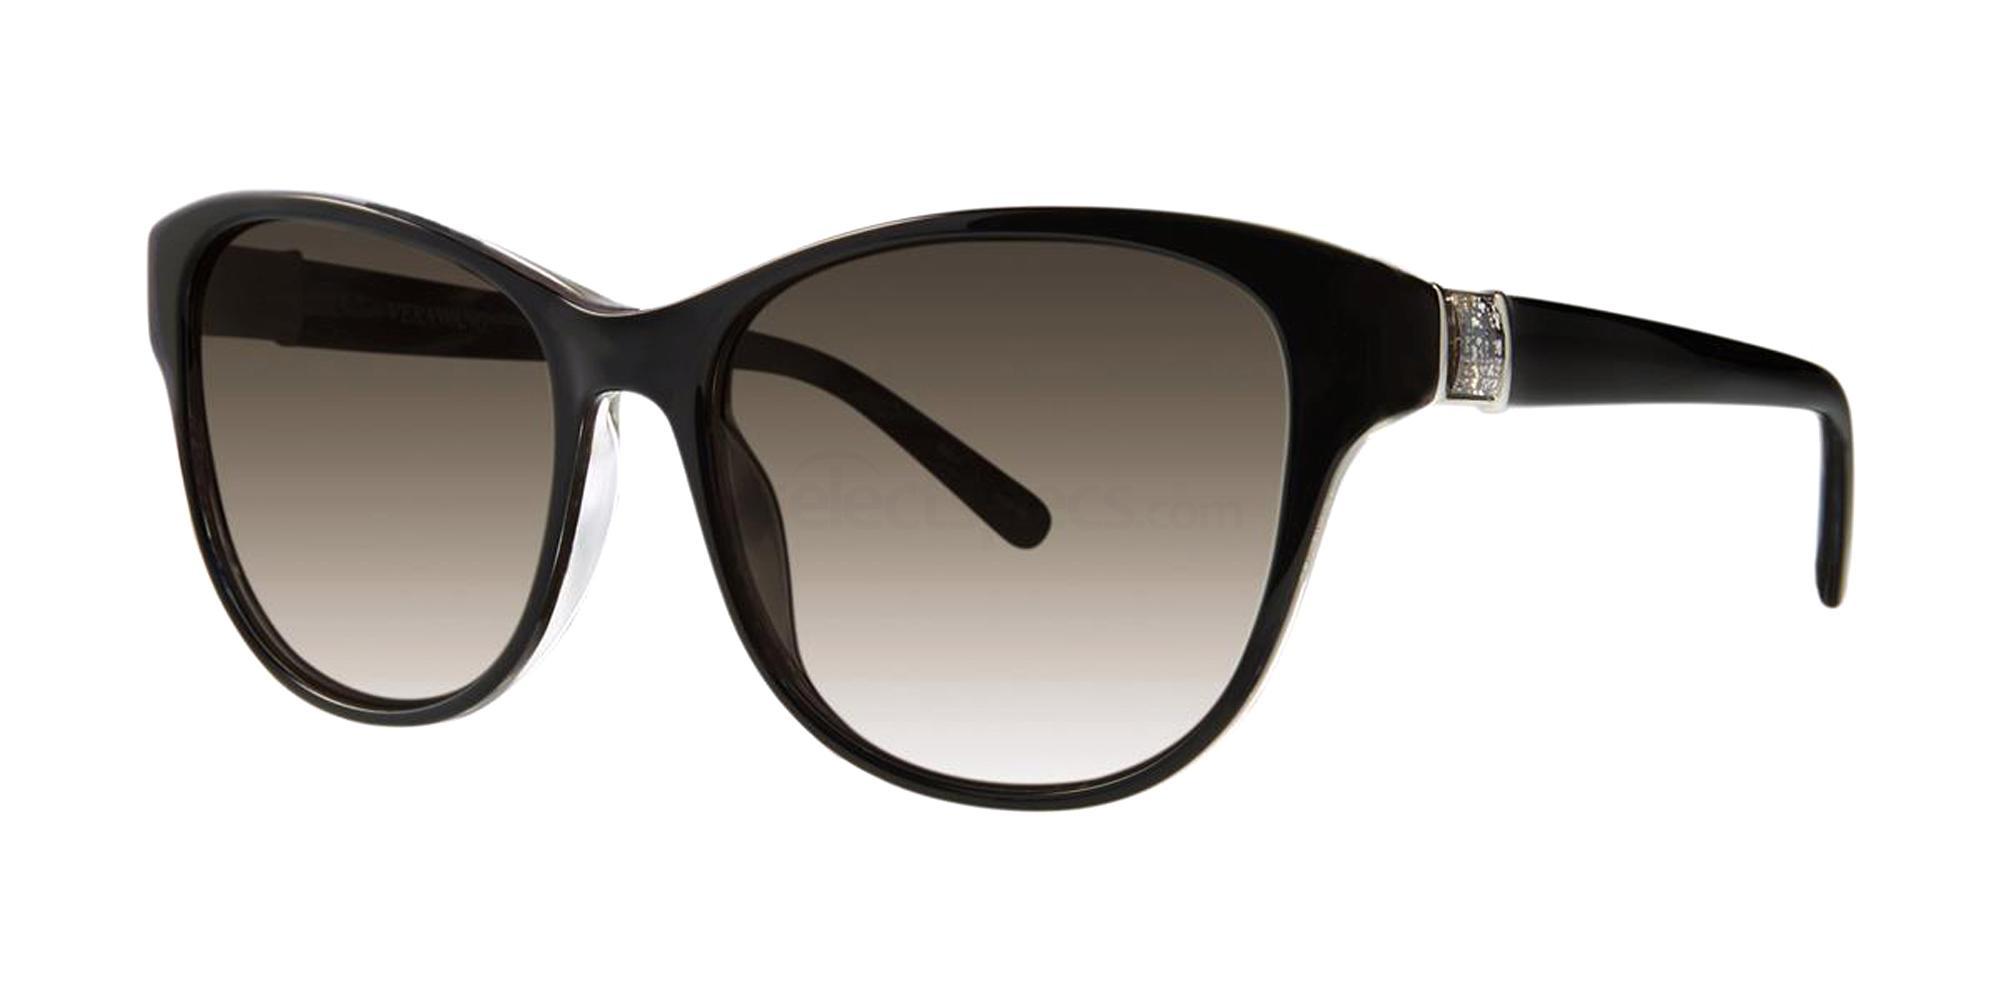 Ebony CORINNA Sunglasses, Vera Wang Luxe